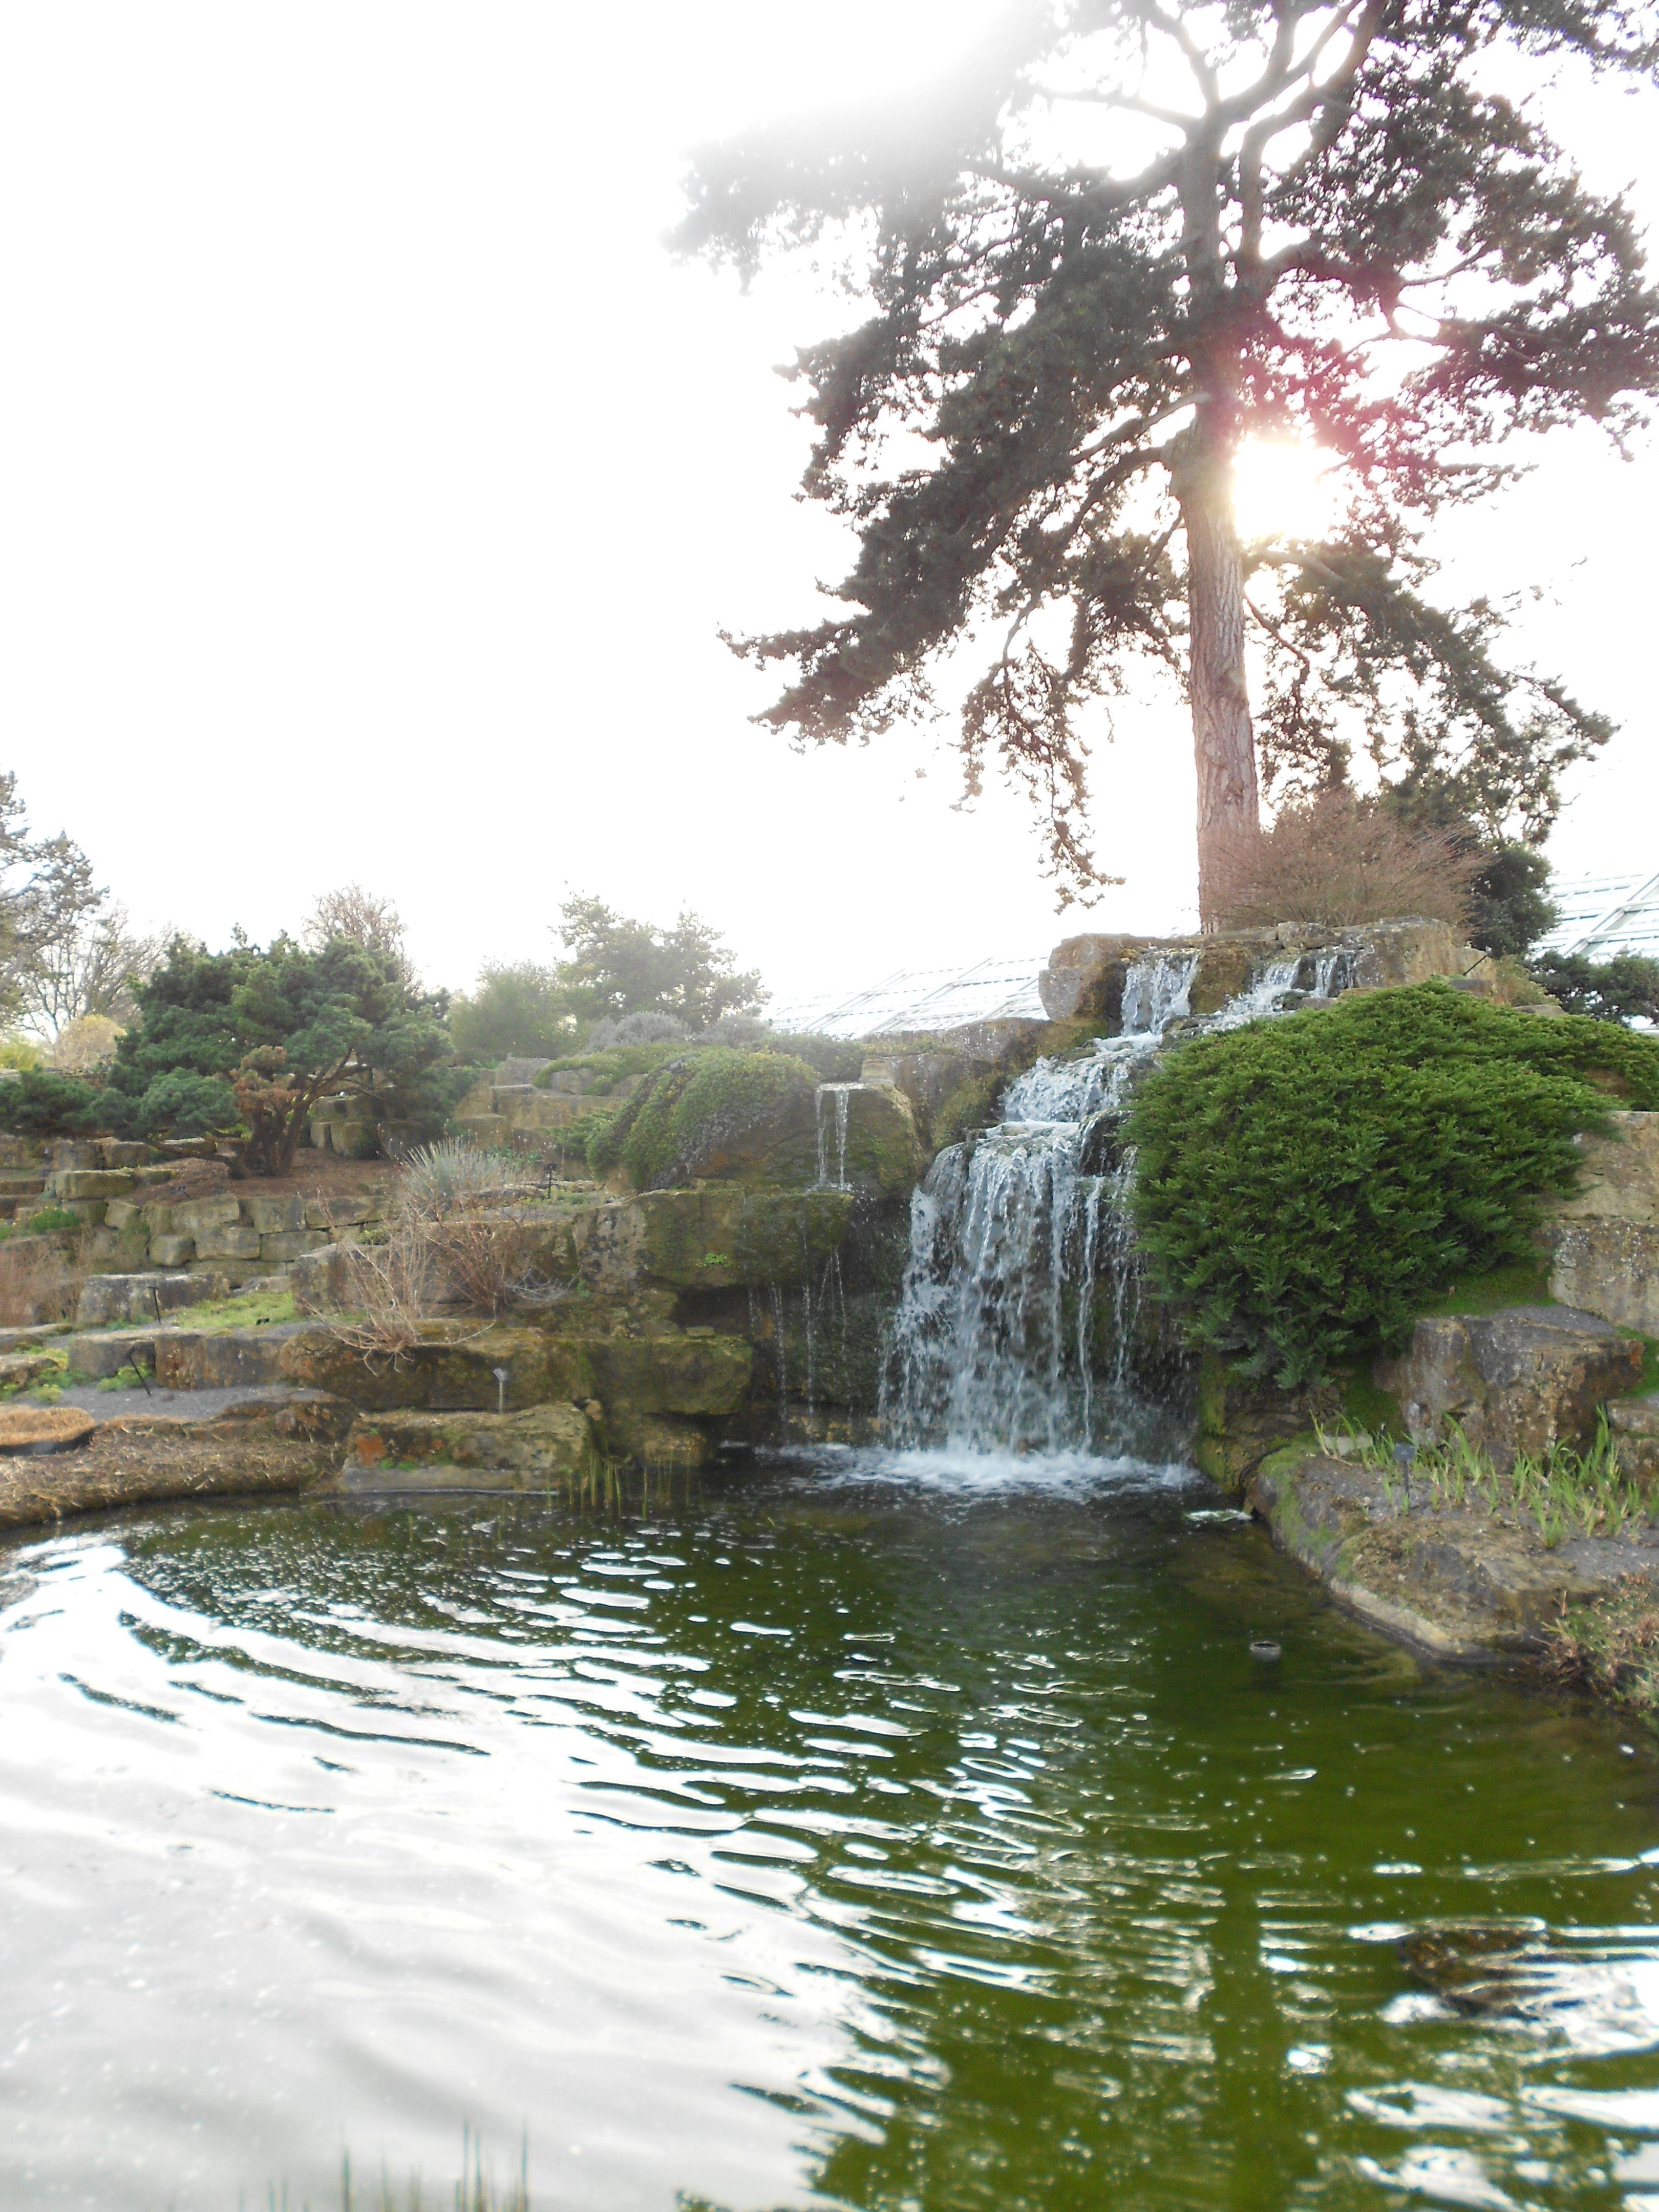 16bf0e000e26c259b08ee249e3361b59 - Getting To Kew Gardens By River